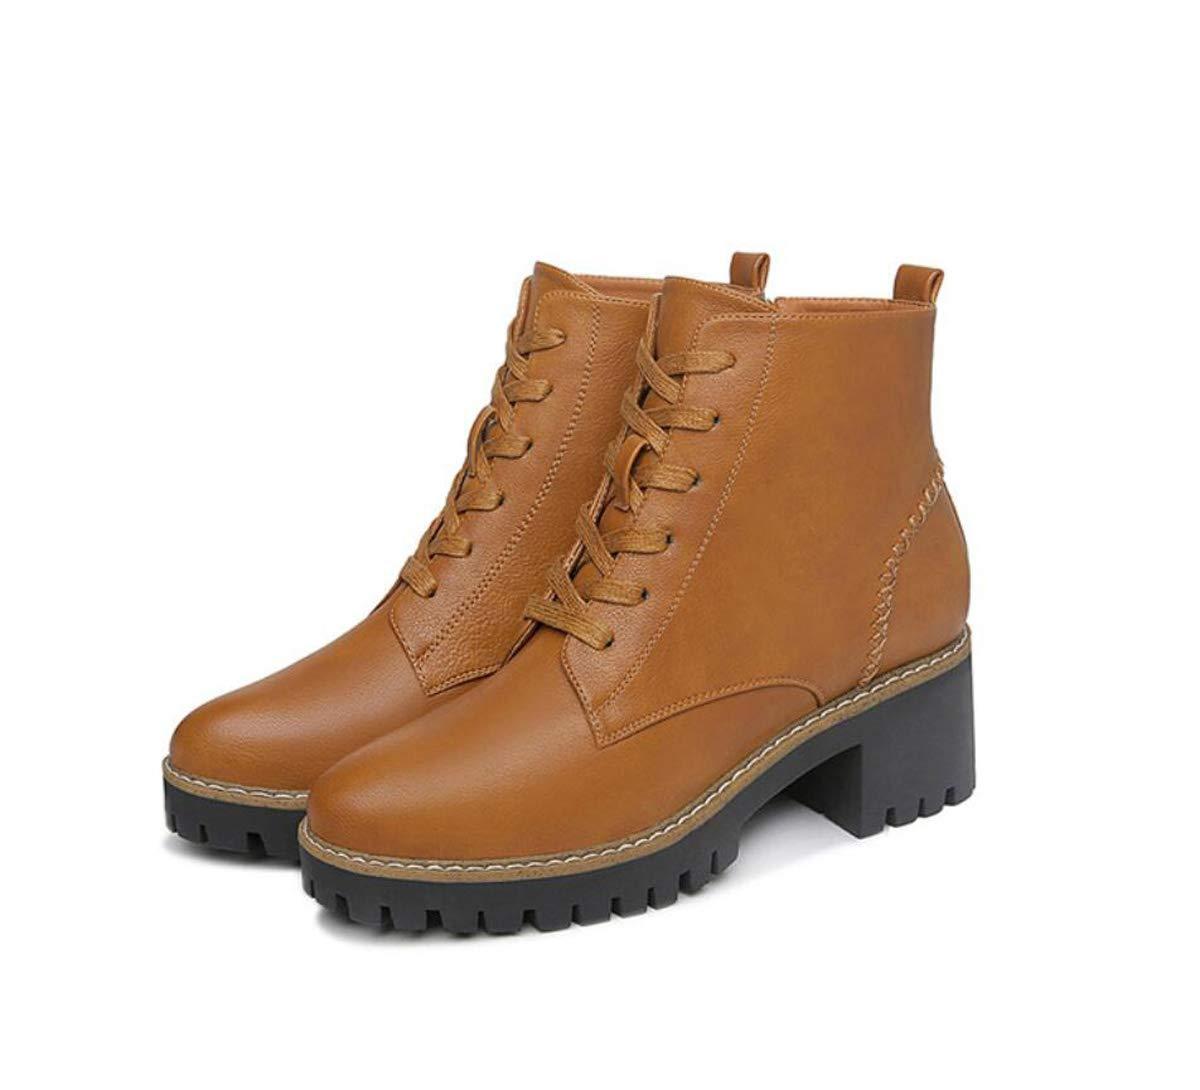 A Booties Women Fall Winter Block Heel shoes Zipper Fake Lace Up Martin Boots (Black Brown)